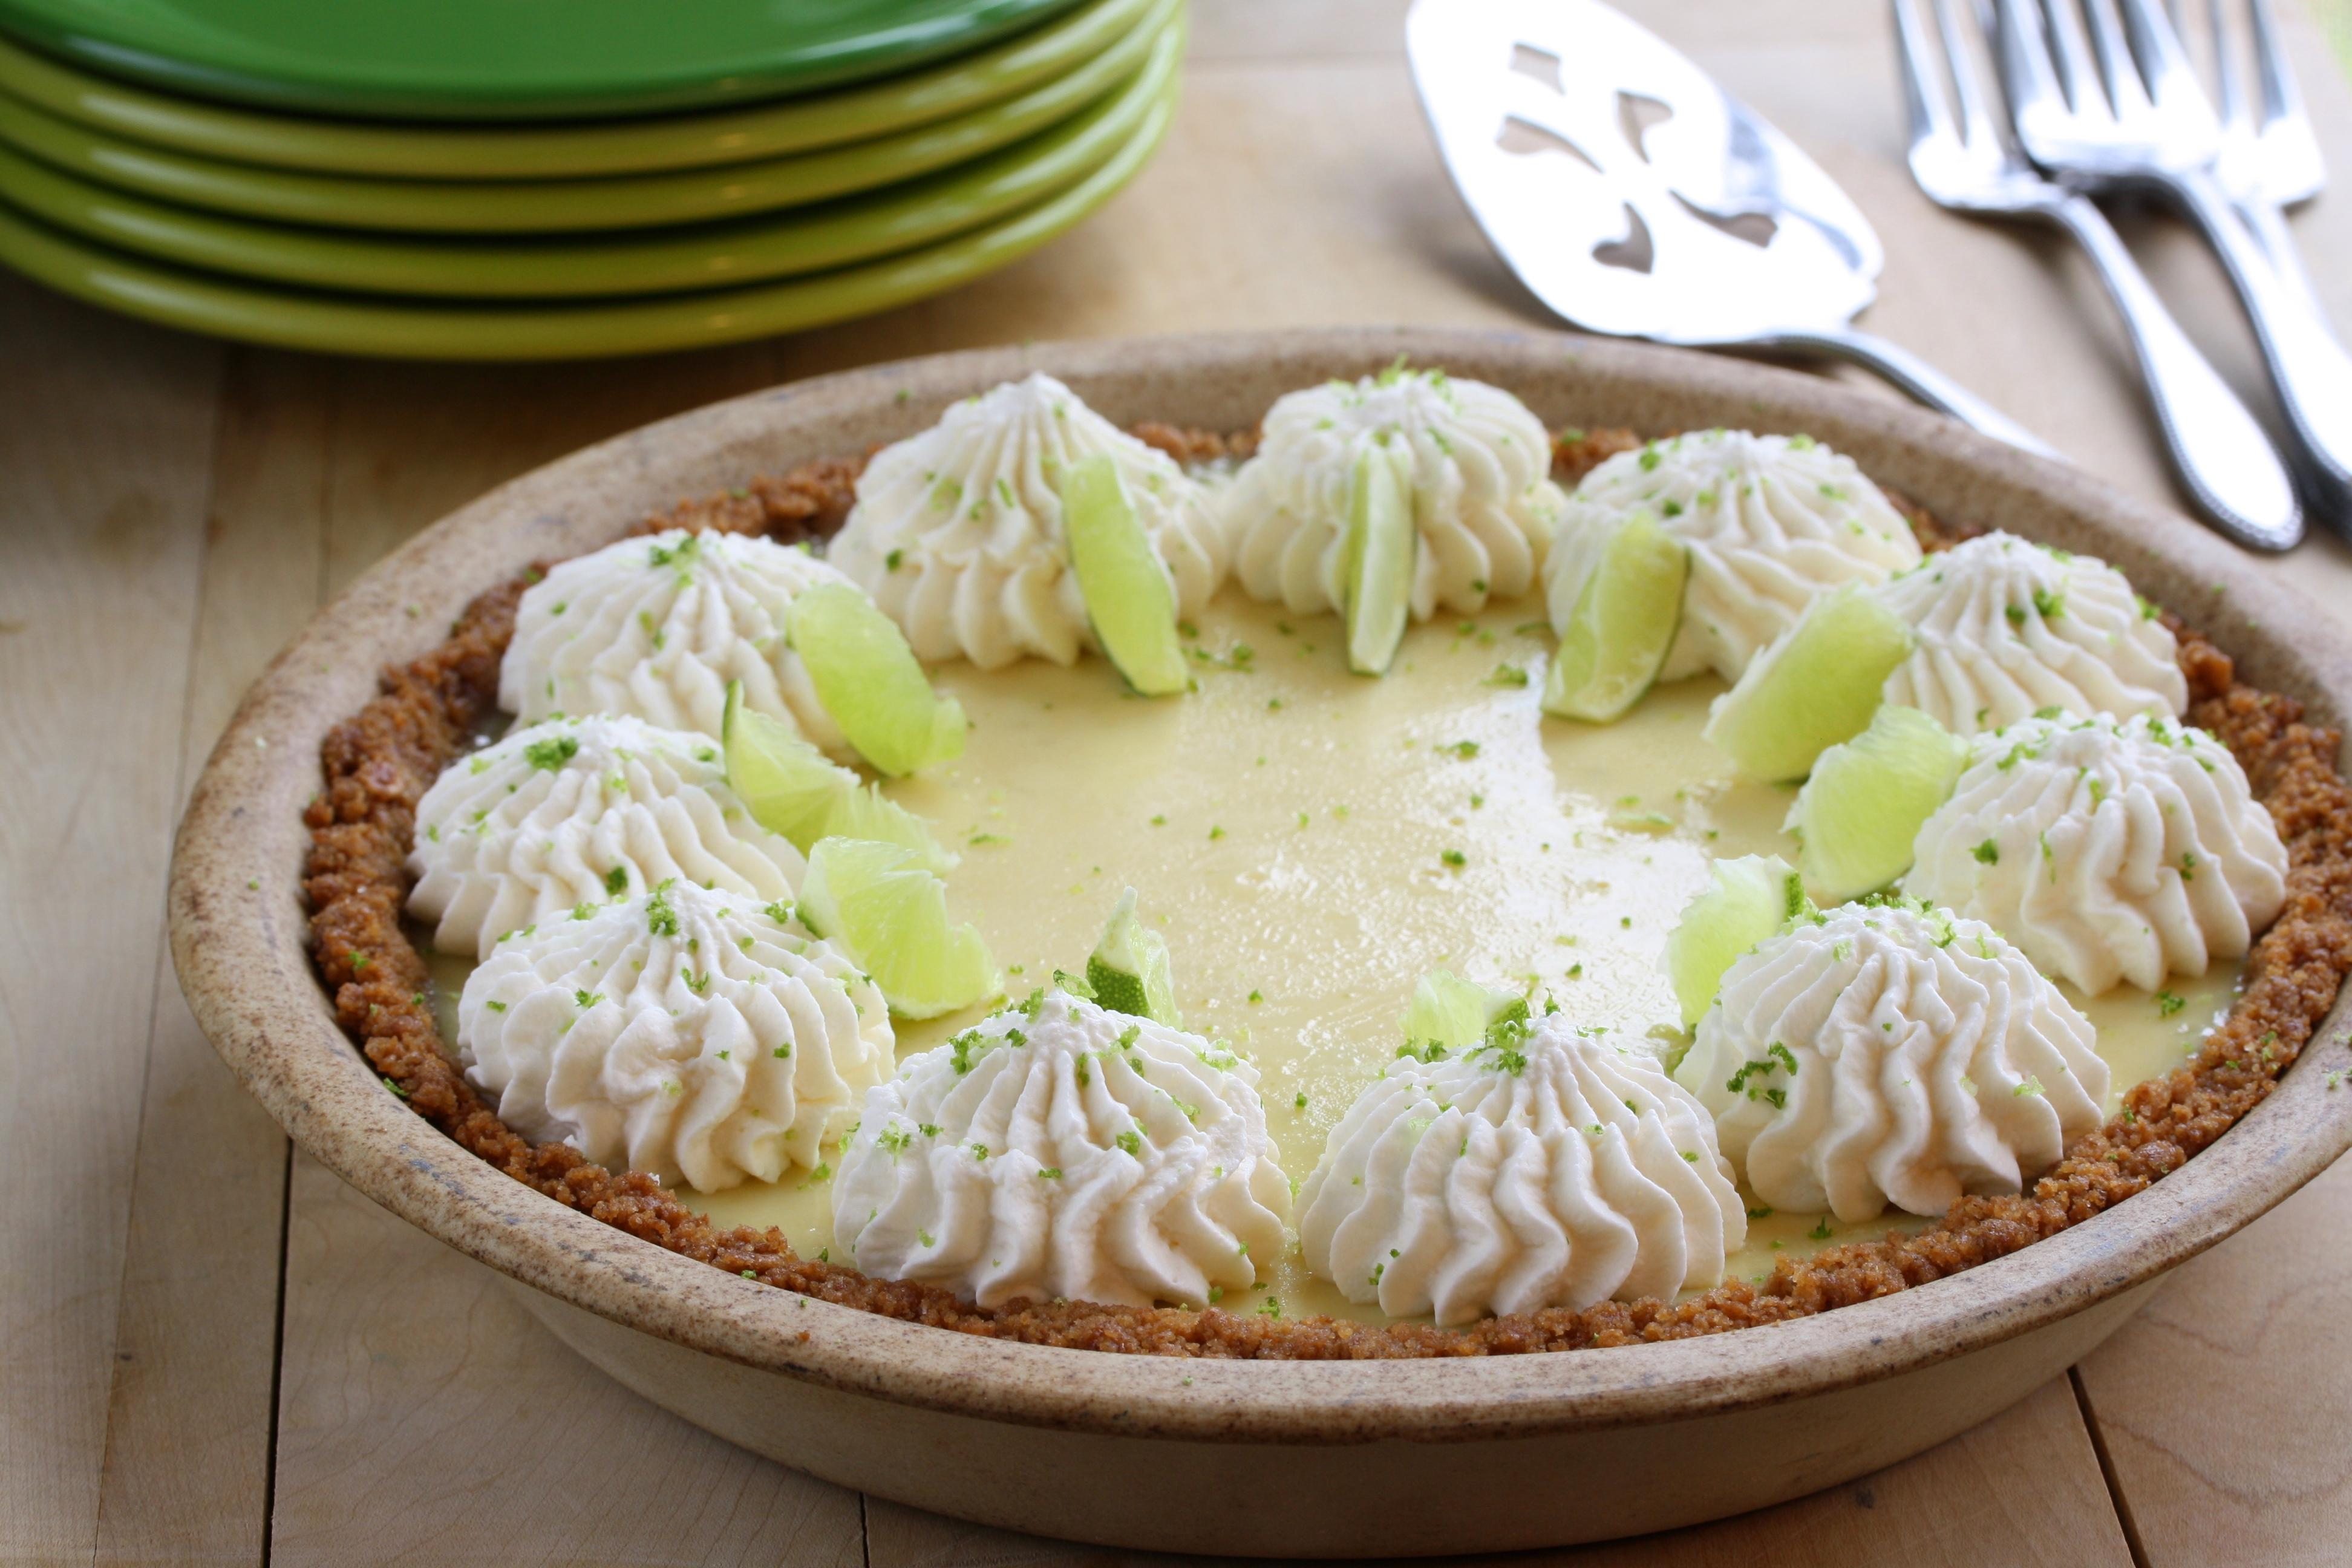 Guest Post: My Favorite Summer Pie